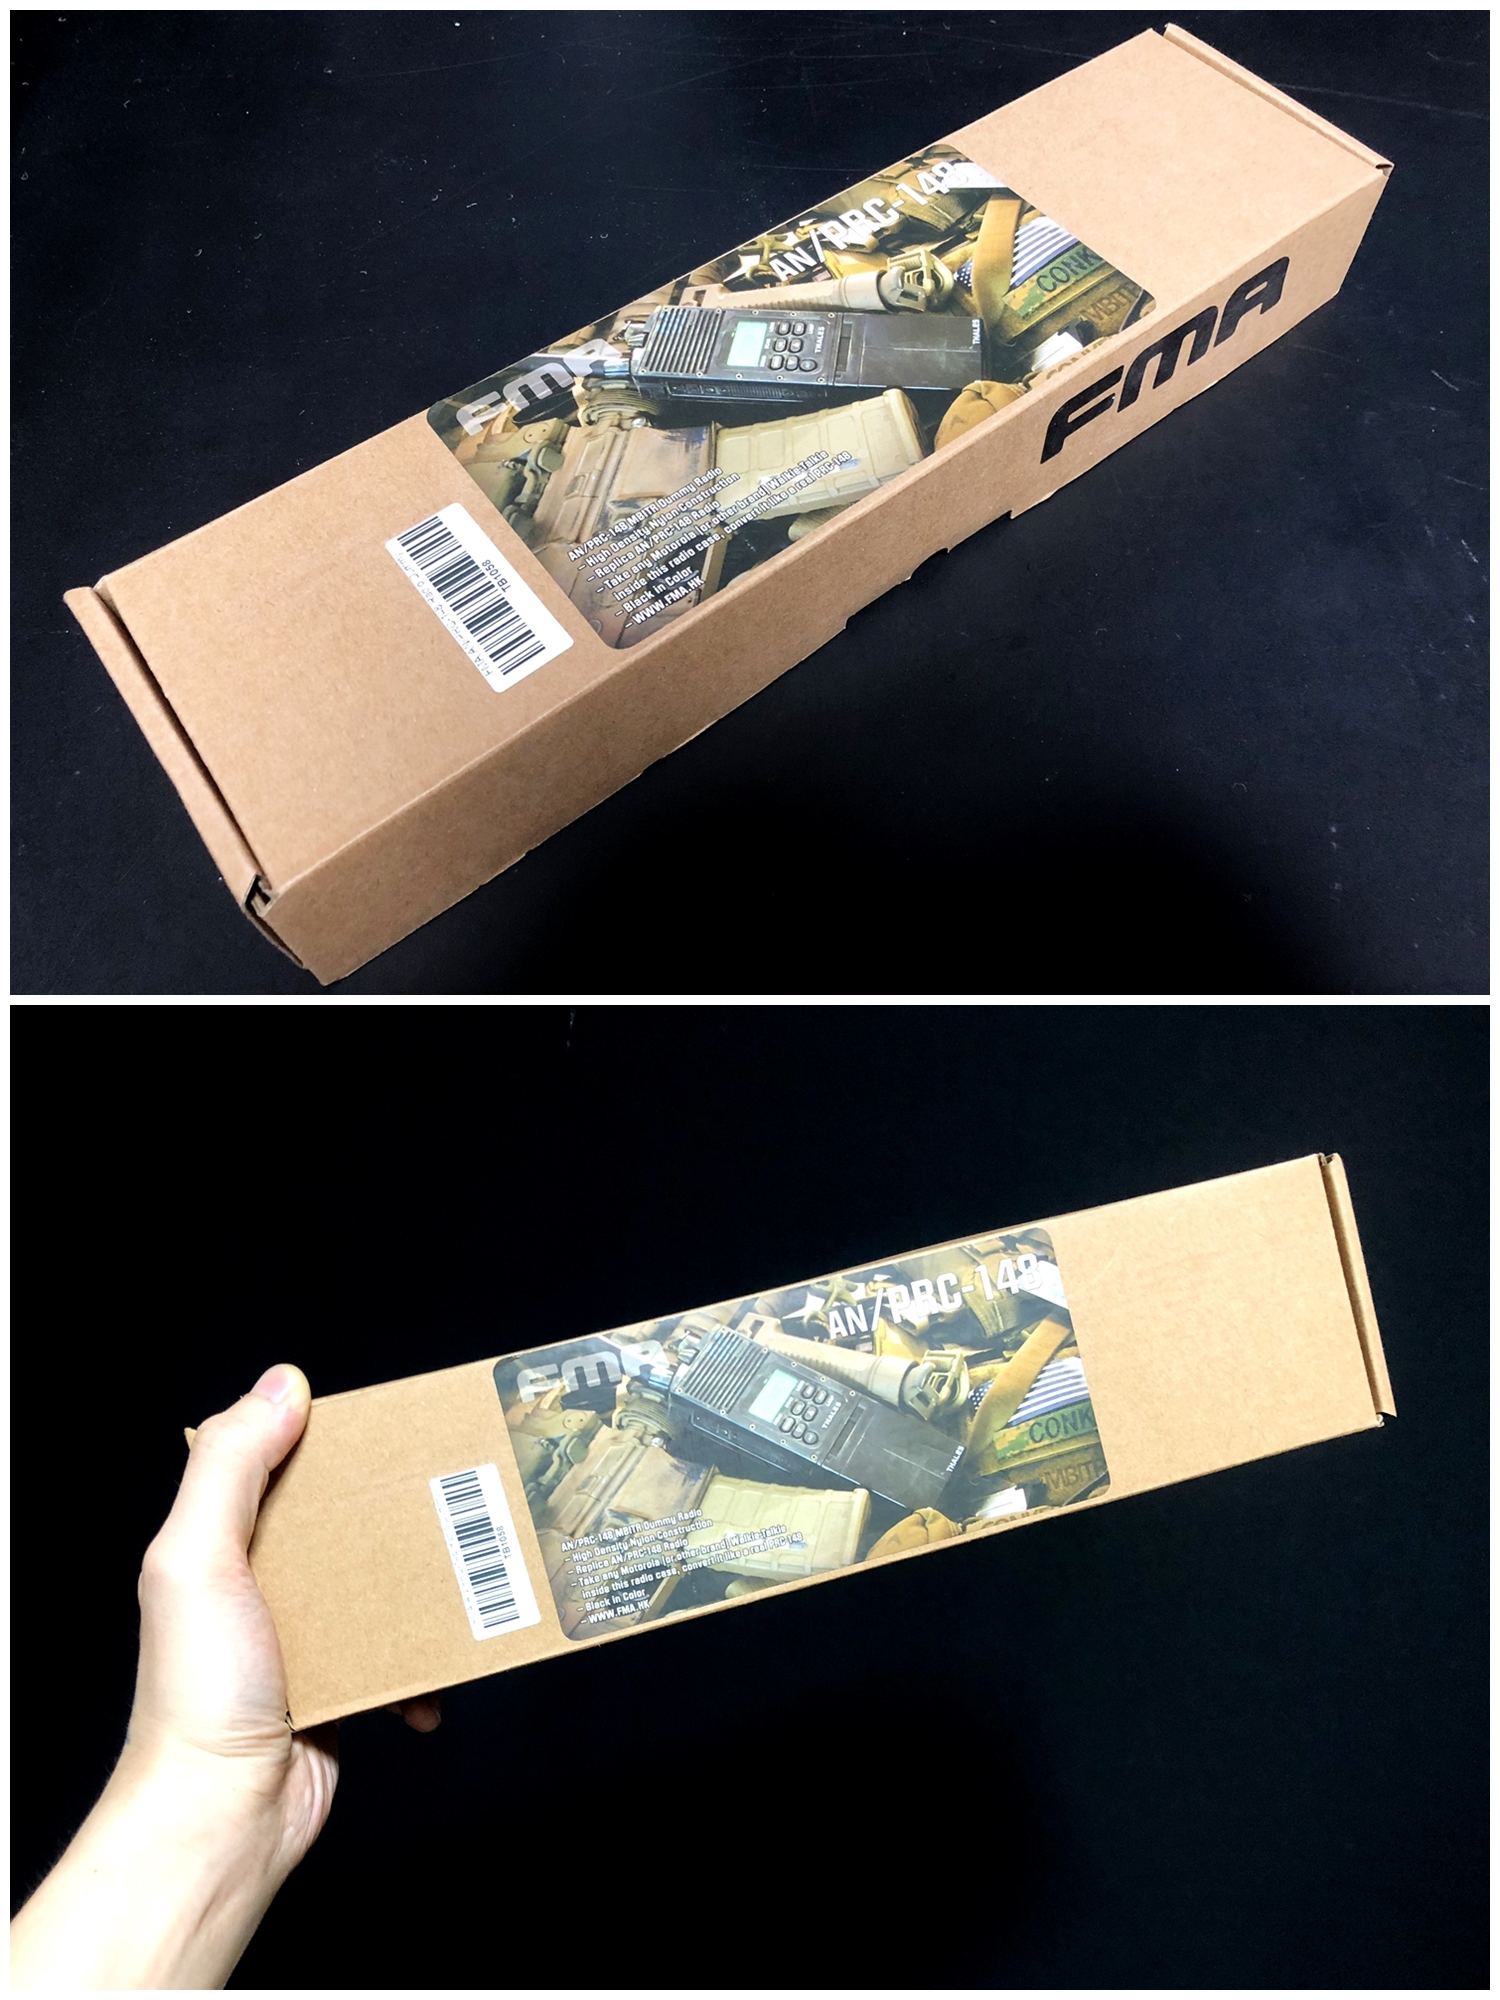 2 AN PRC 148 AN PRC 152 TYPE レプリカ ダミーラジオ 装備 コスプレ 実物 リアル サバゲー オススメ 購入 レビュー カスタム 改造